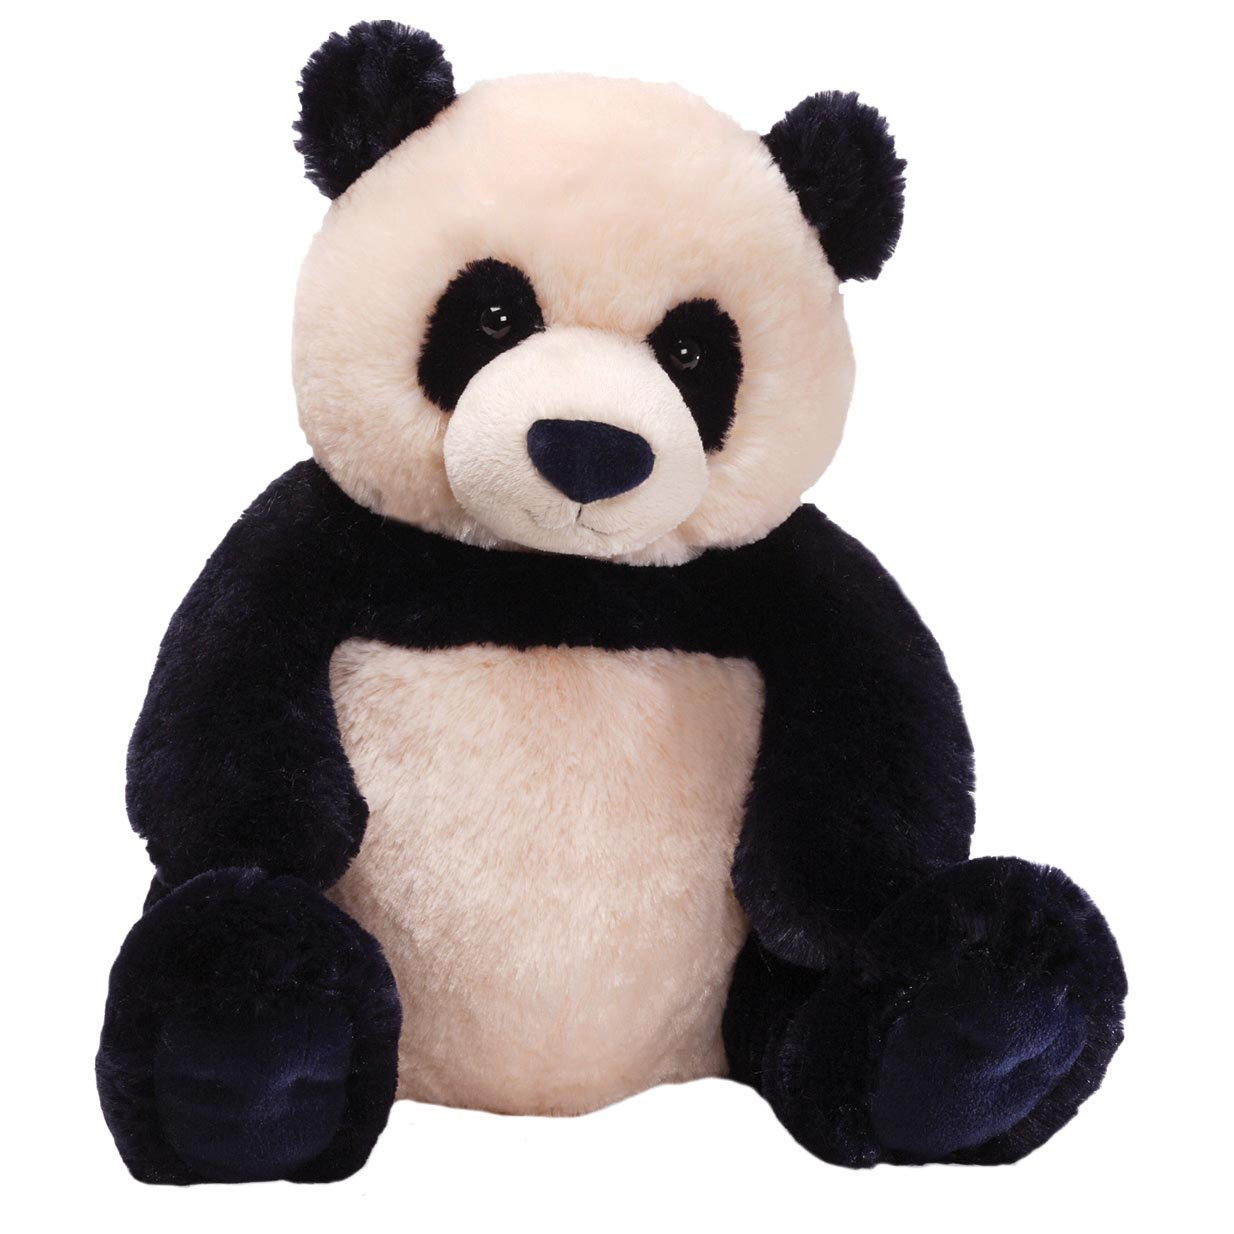 GUND Zi-Bo Panda Teddy Bear Stuffed Animal Plush, 17'' by GUND